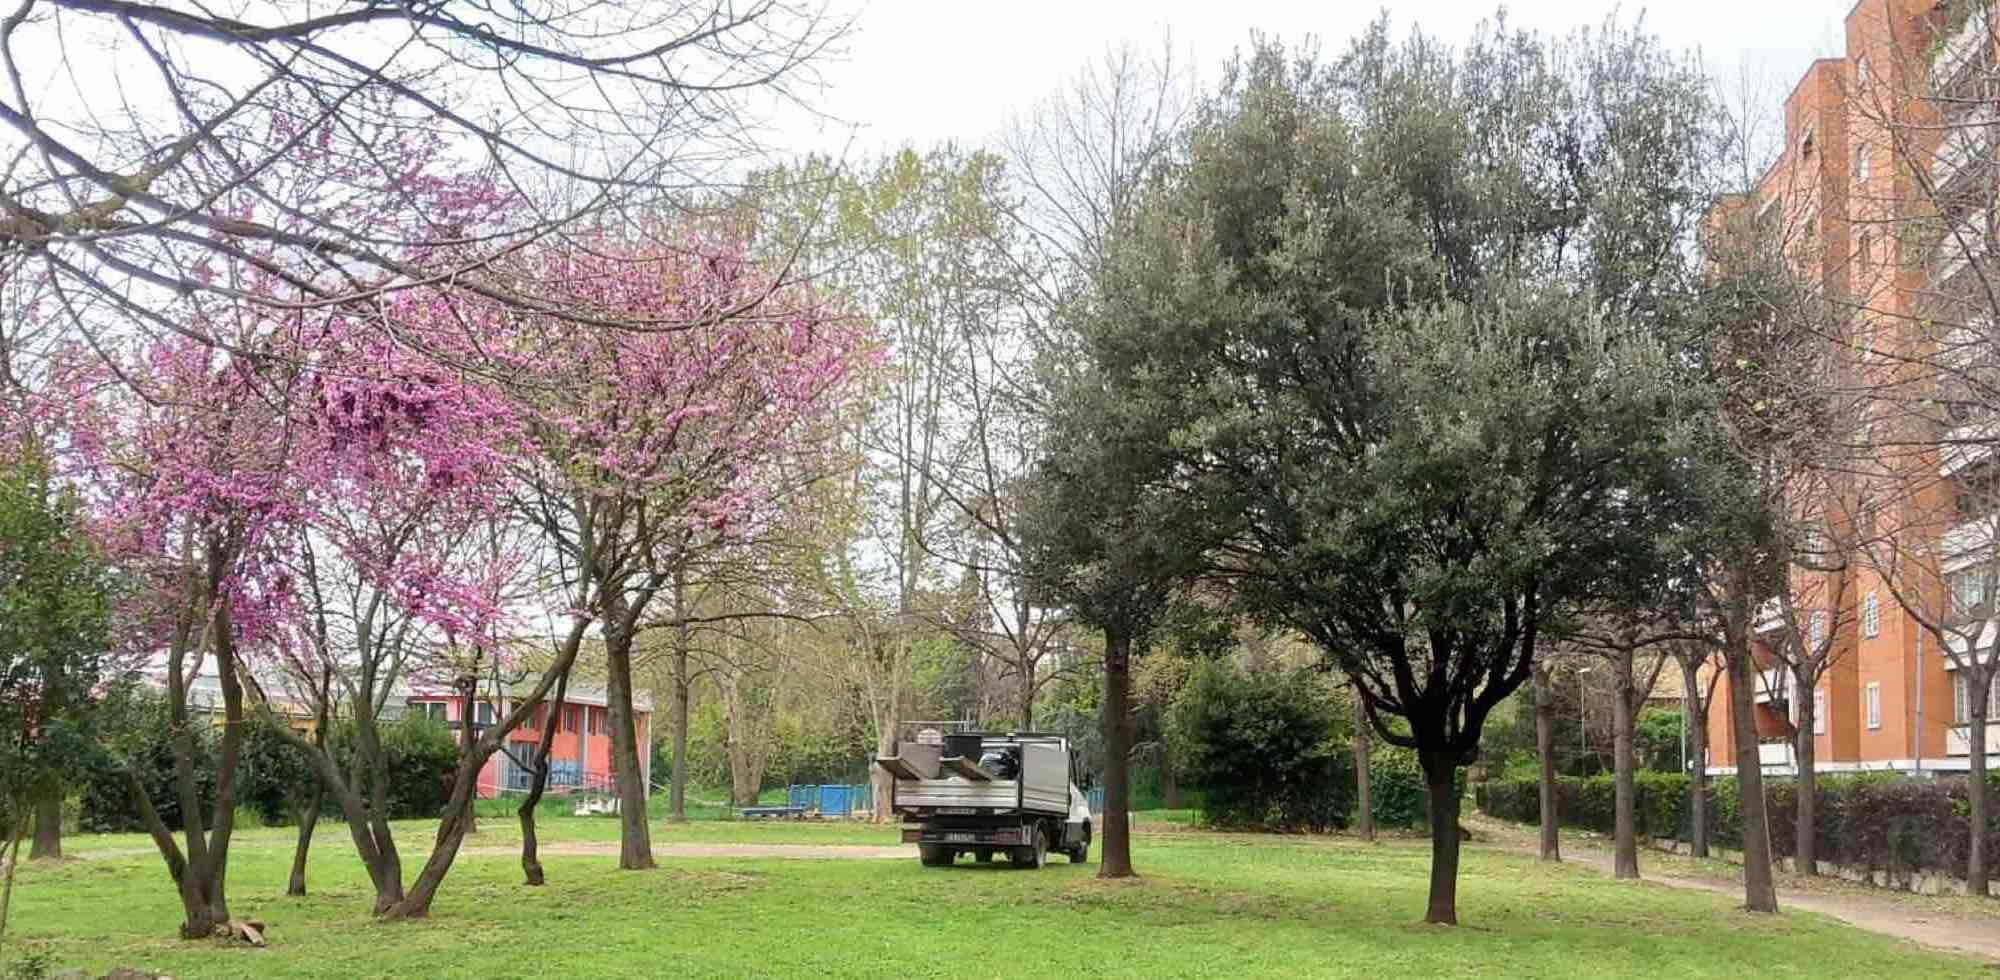 alberi-fiori-verde-prato-camion